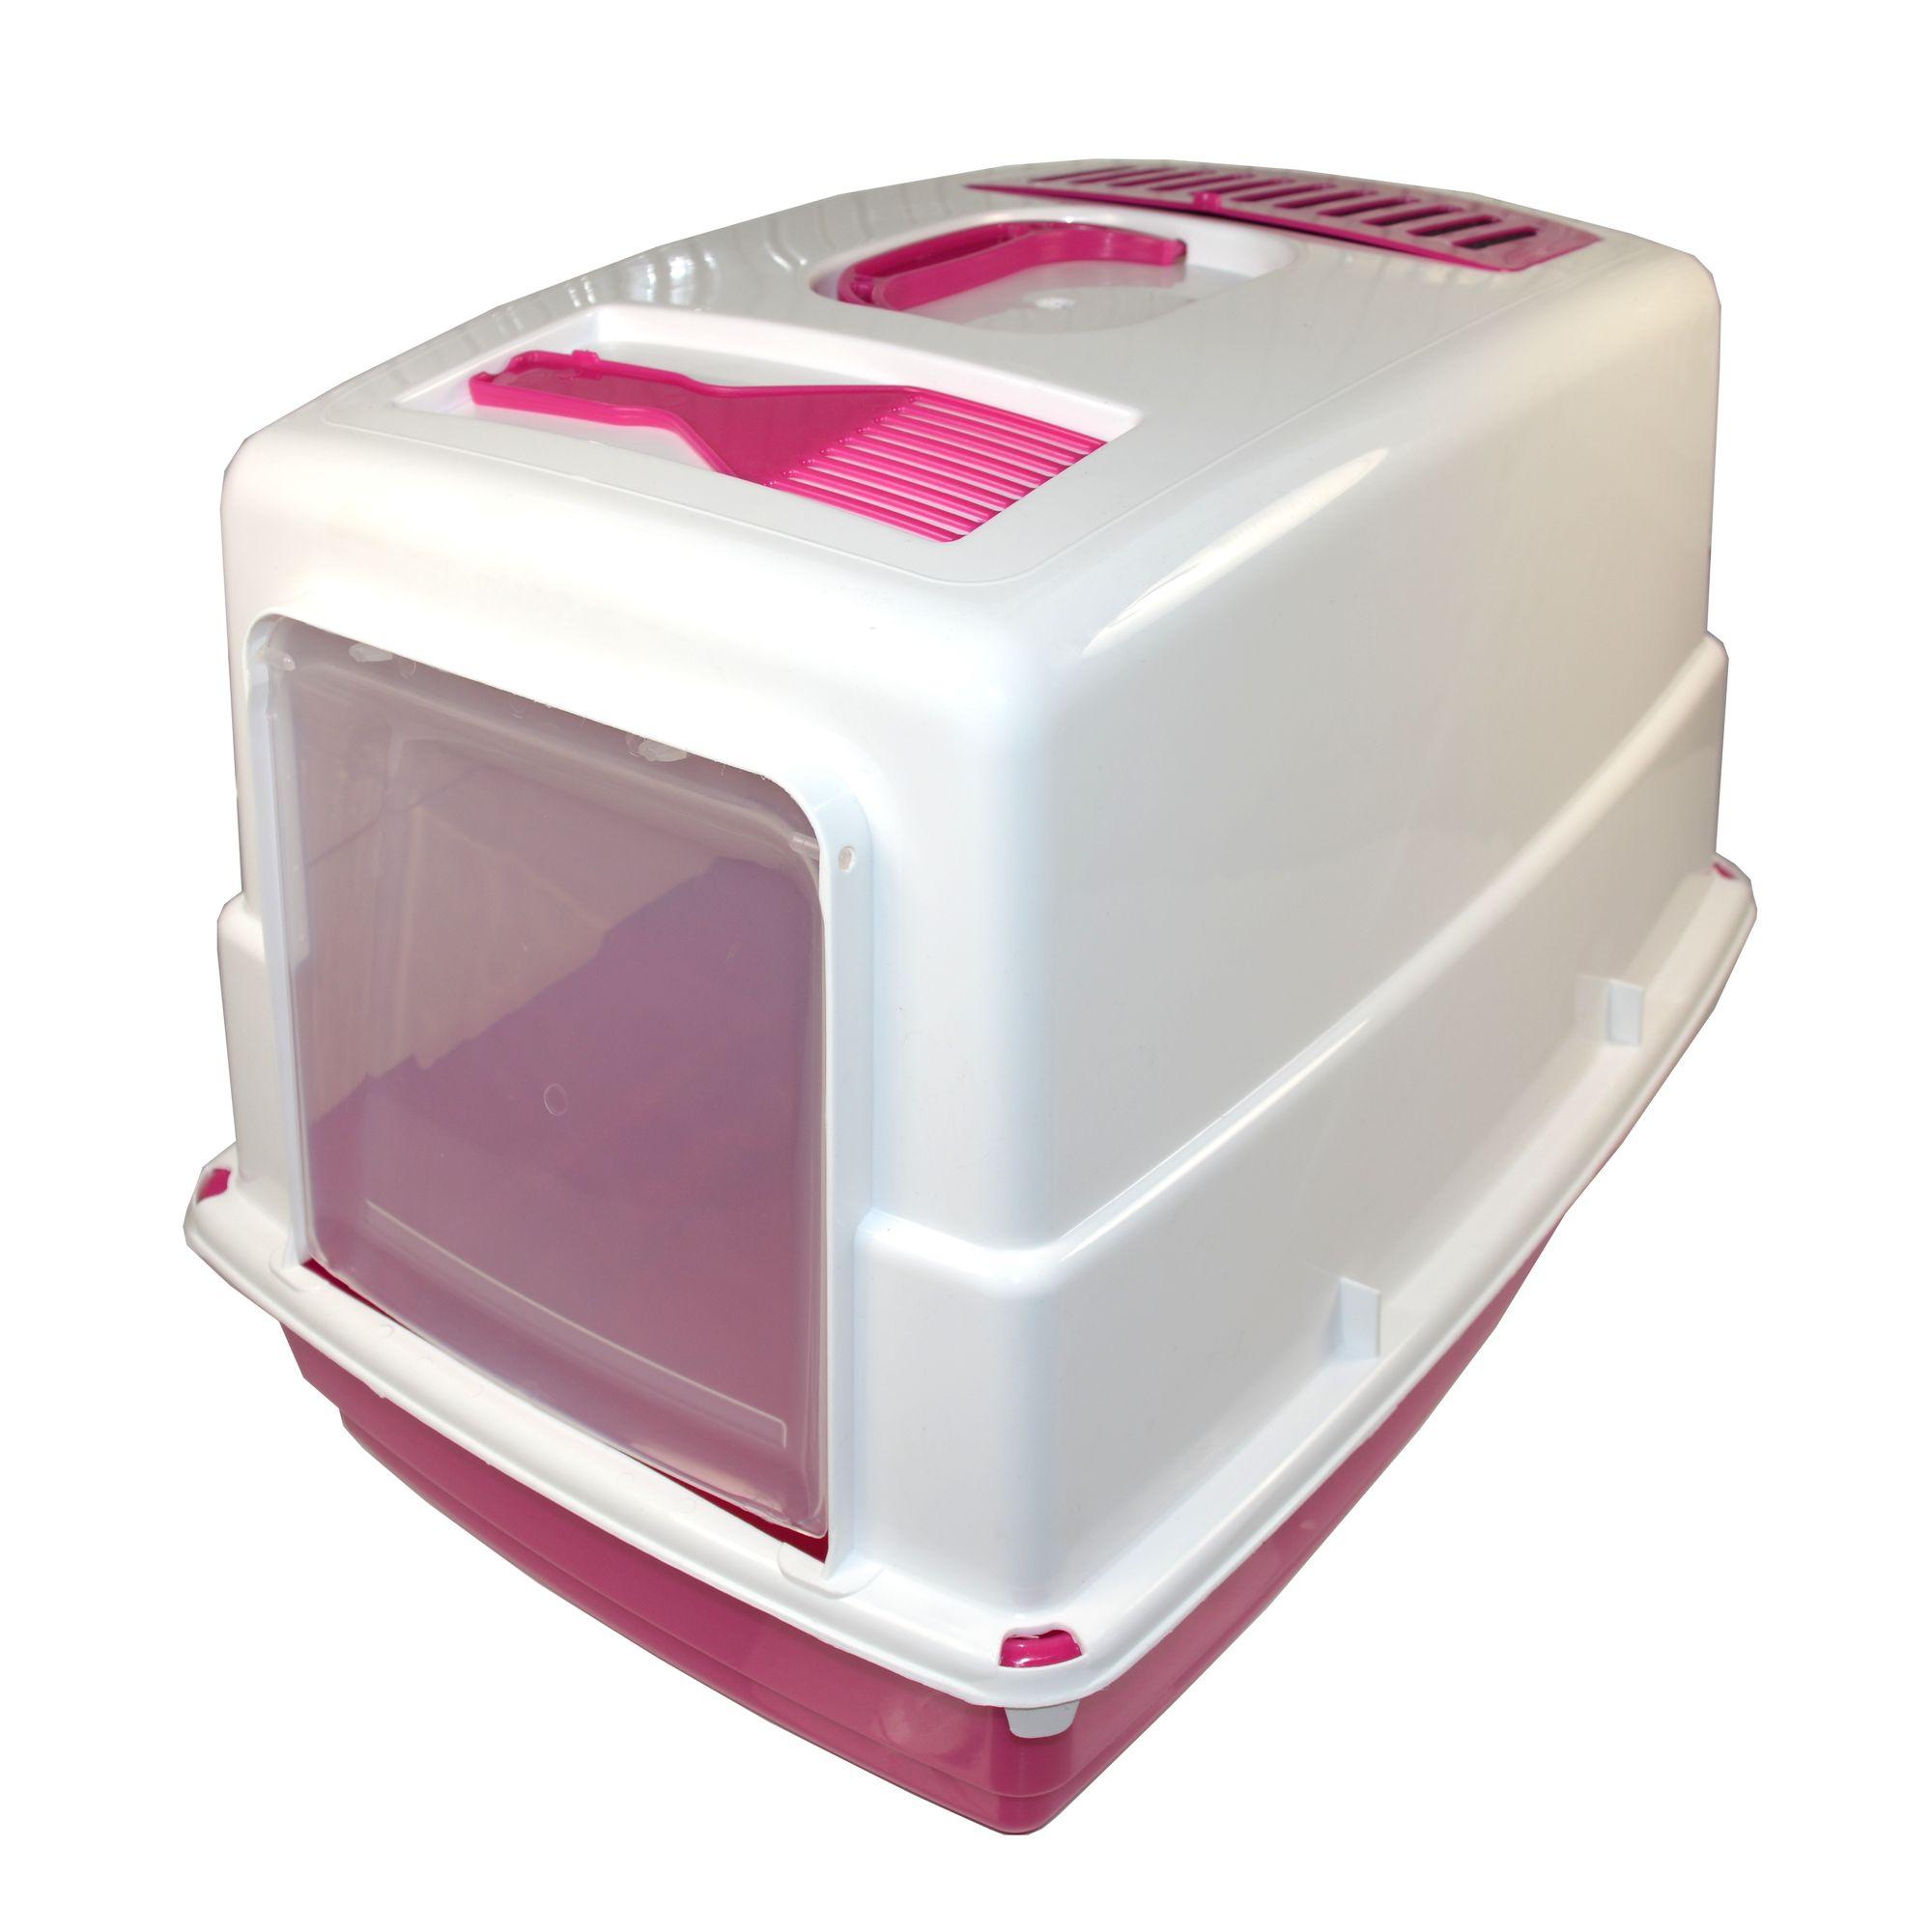 Krytá toaleta s filtrem a lopatkou Argi - růžová - 54 x 39 x 39 cm